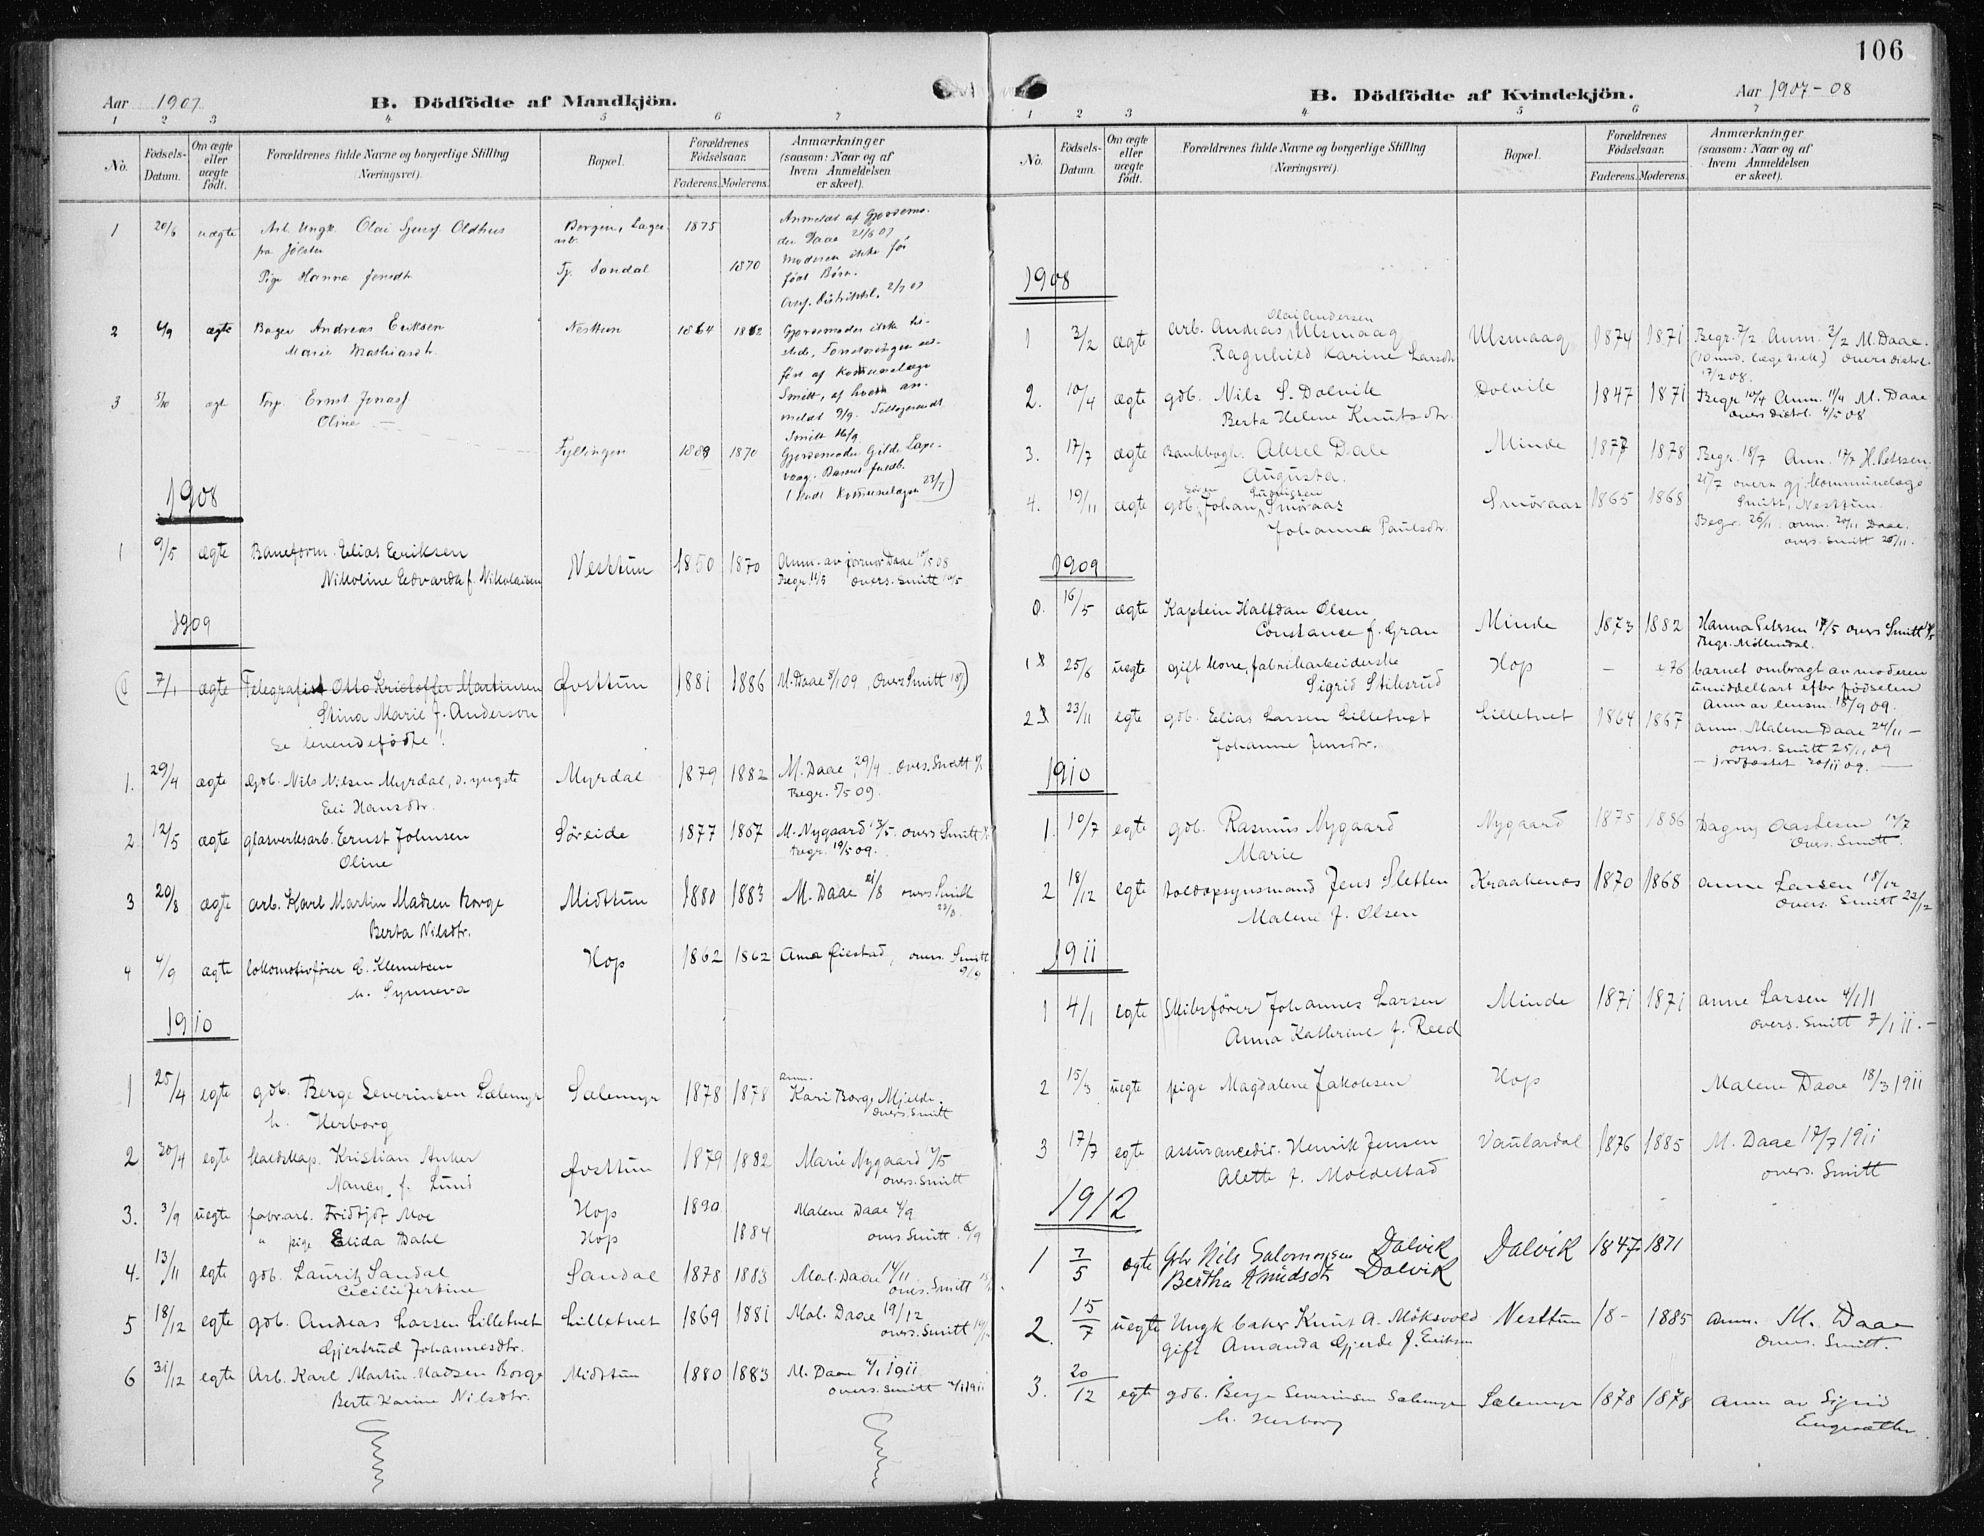 SAB, Fana Sokneprestembete, H/Haa/Haai/L0003: Ministerialbok nr. I 3, 1900-1912, s. 106